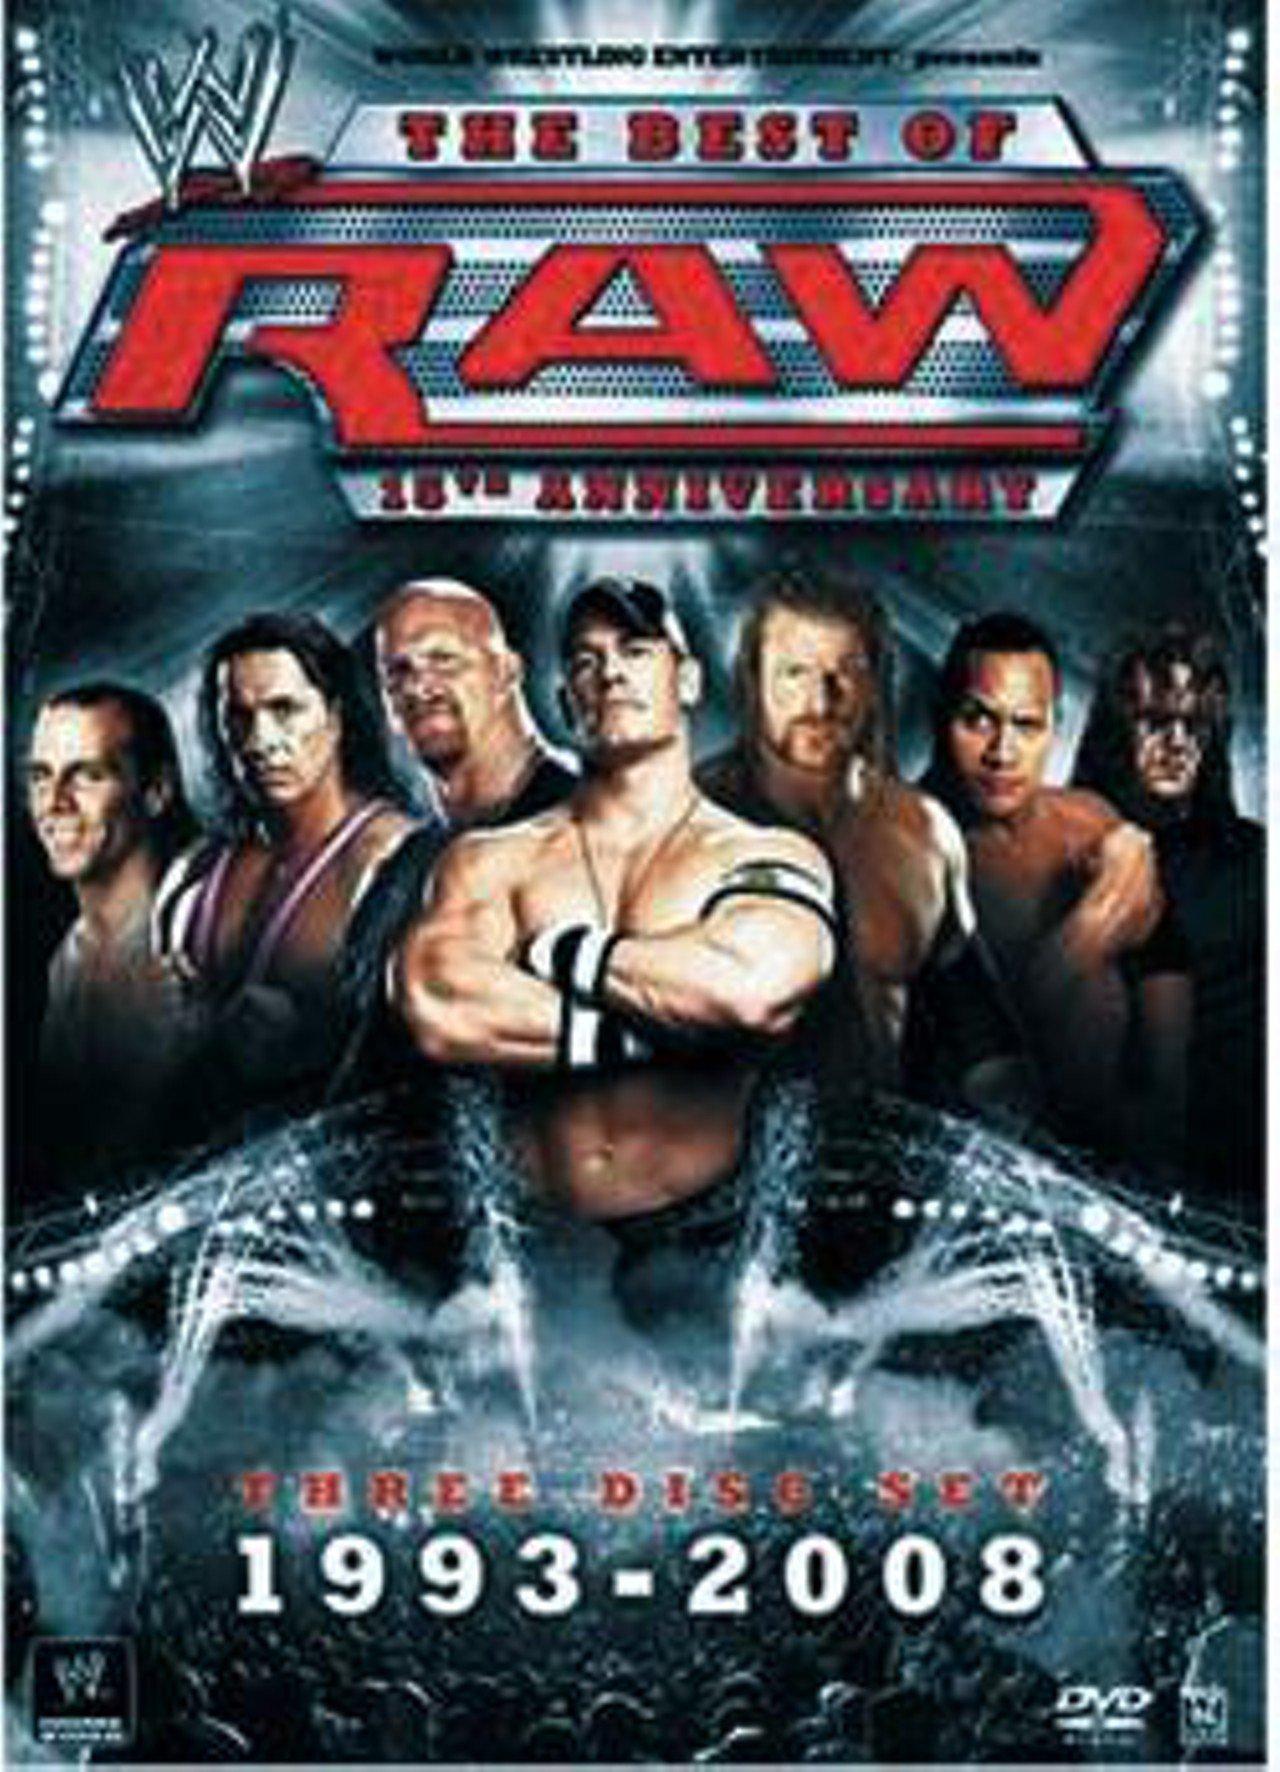 Steve Austin, Adam Copeland, Shawn Michaels, Paul Levesque, and John Cena in WWE: The Best of RAW - 15th Anniversary 1993-2008 (2007)